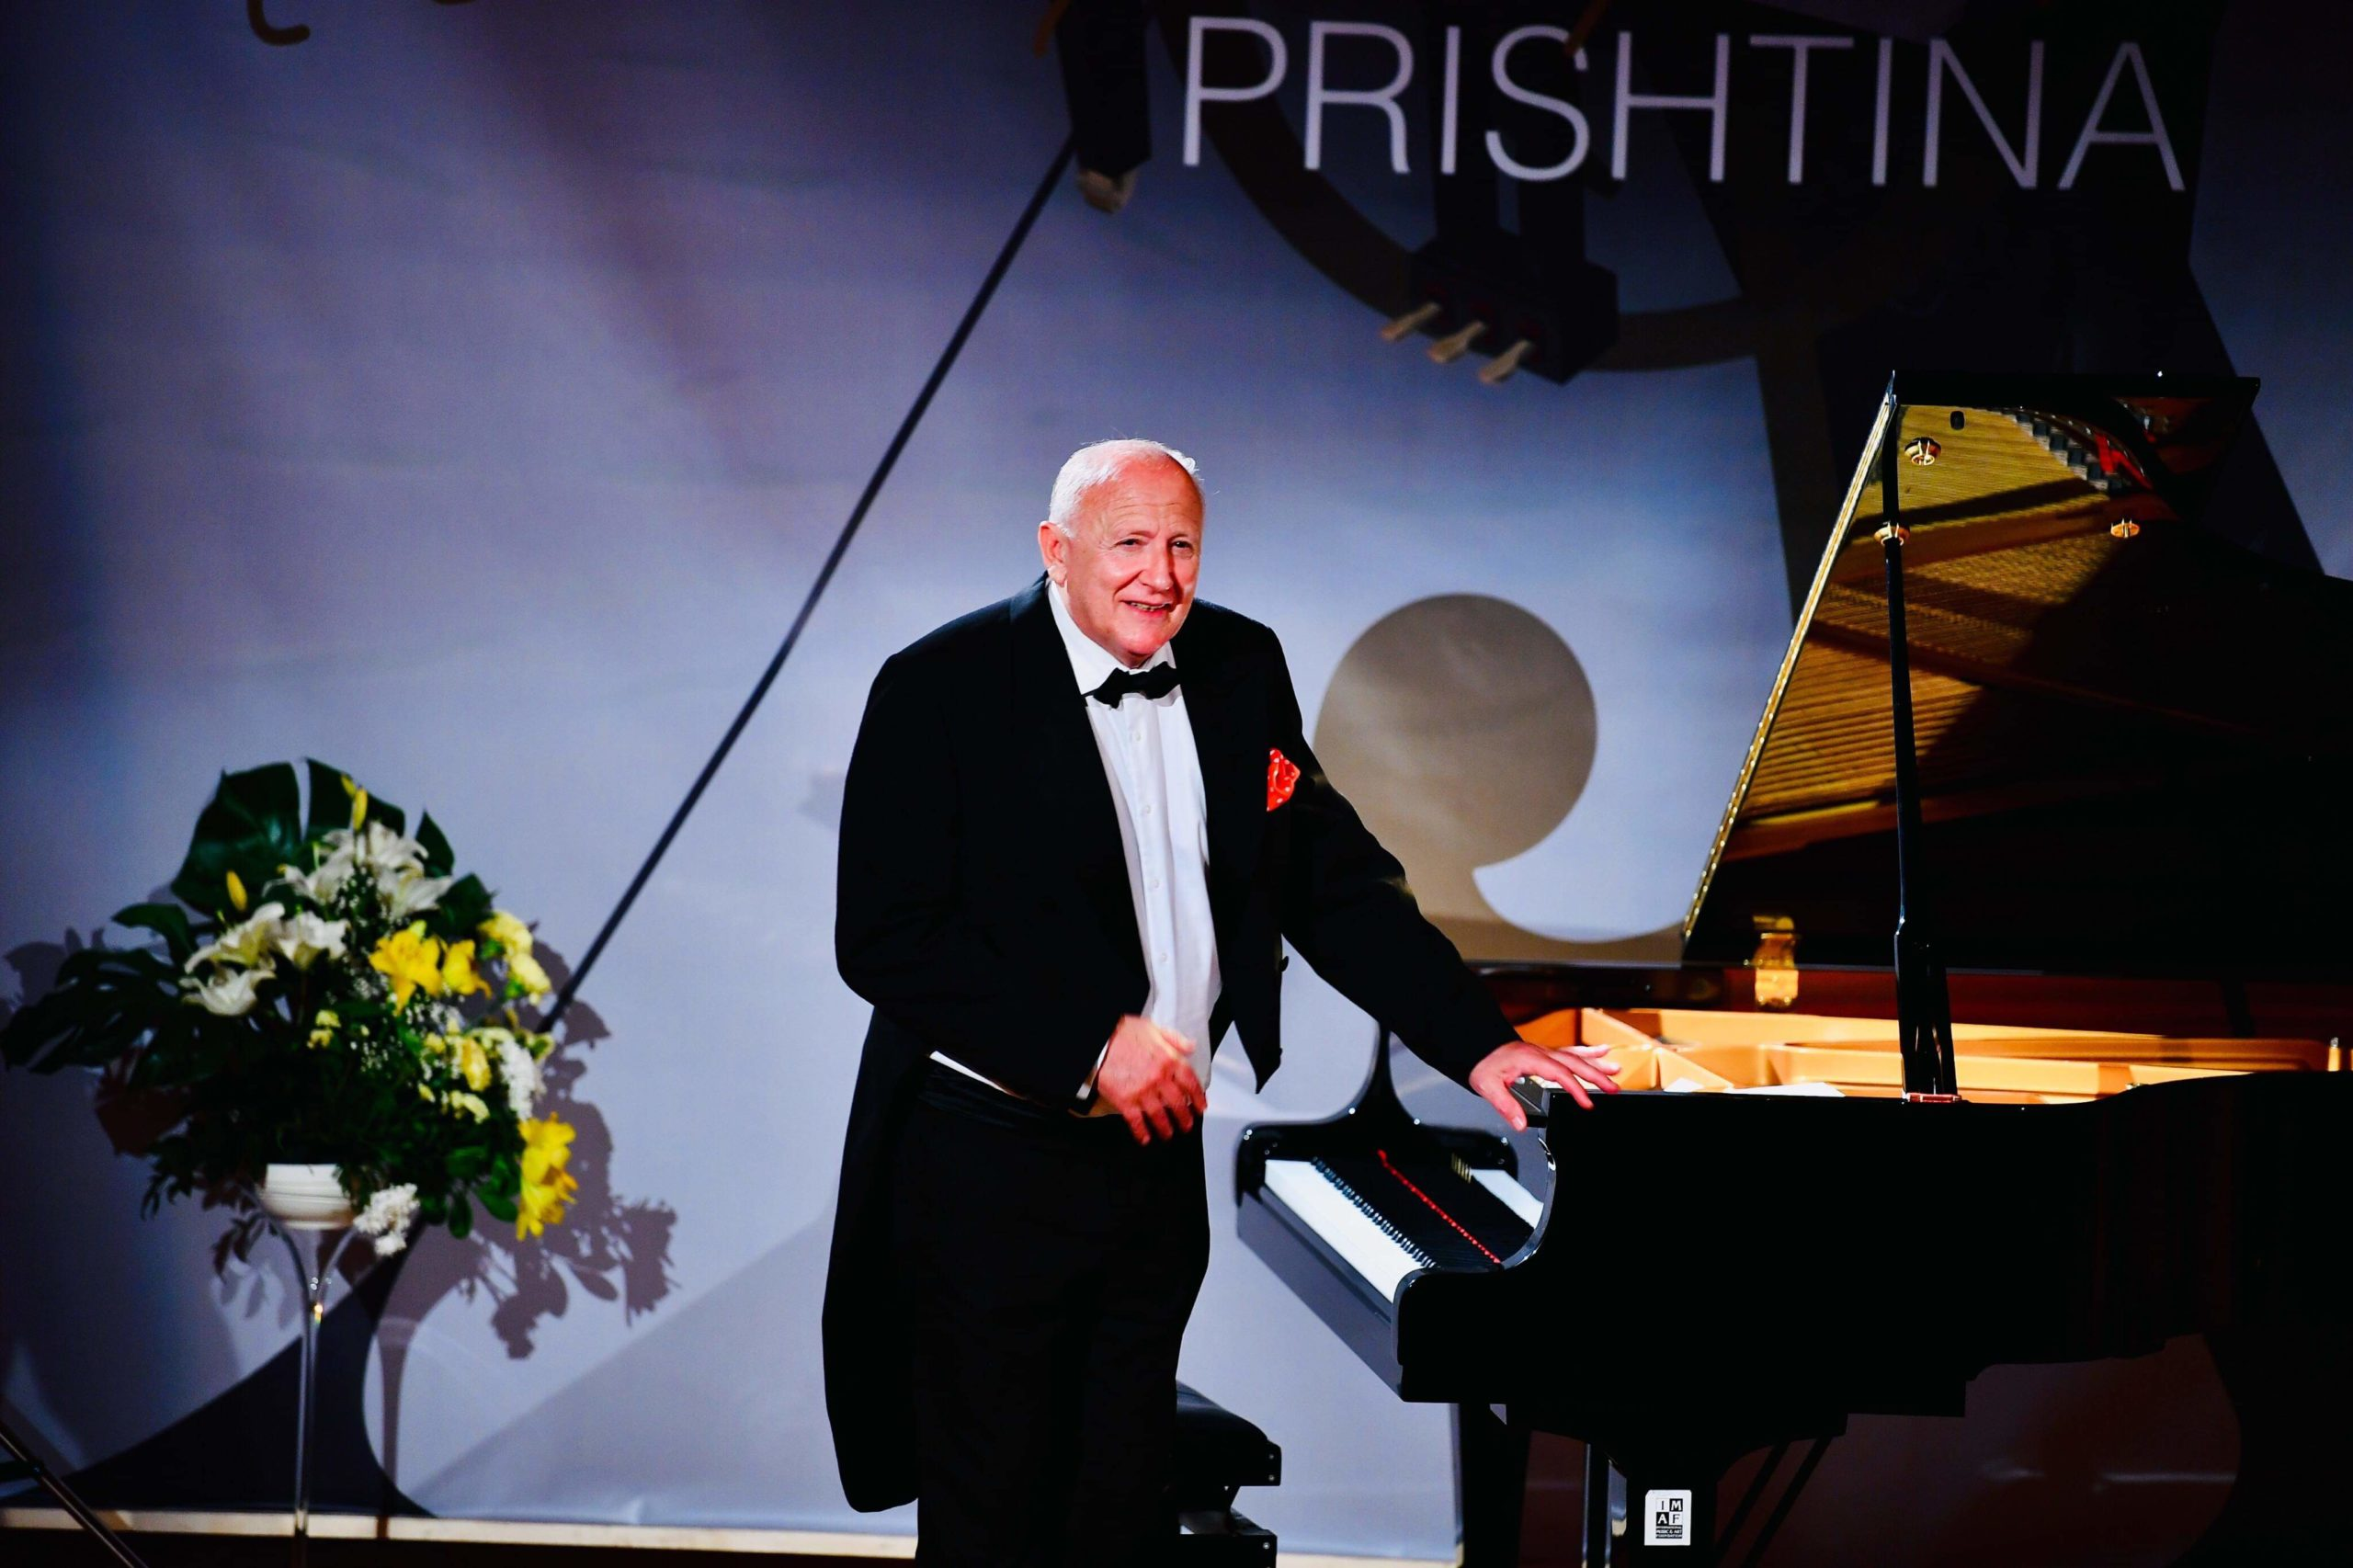 Eric Ferrer Prishtina